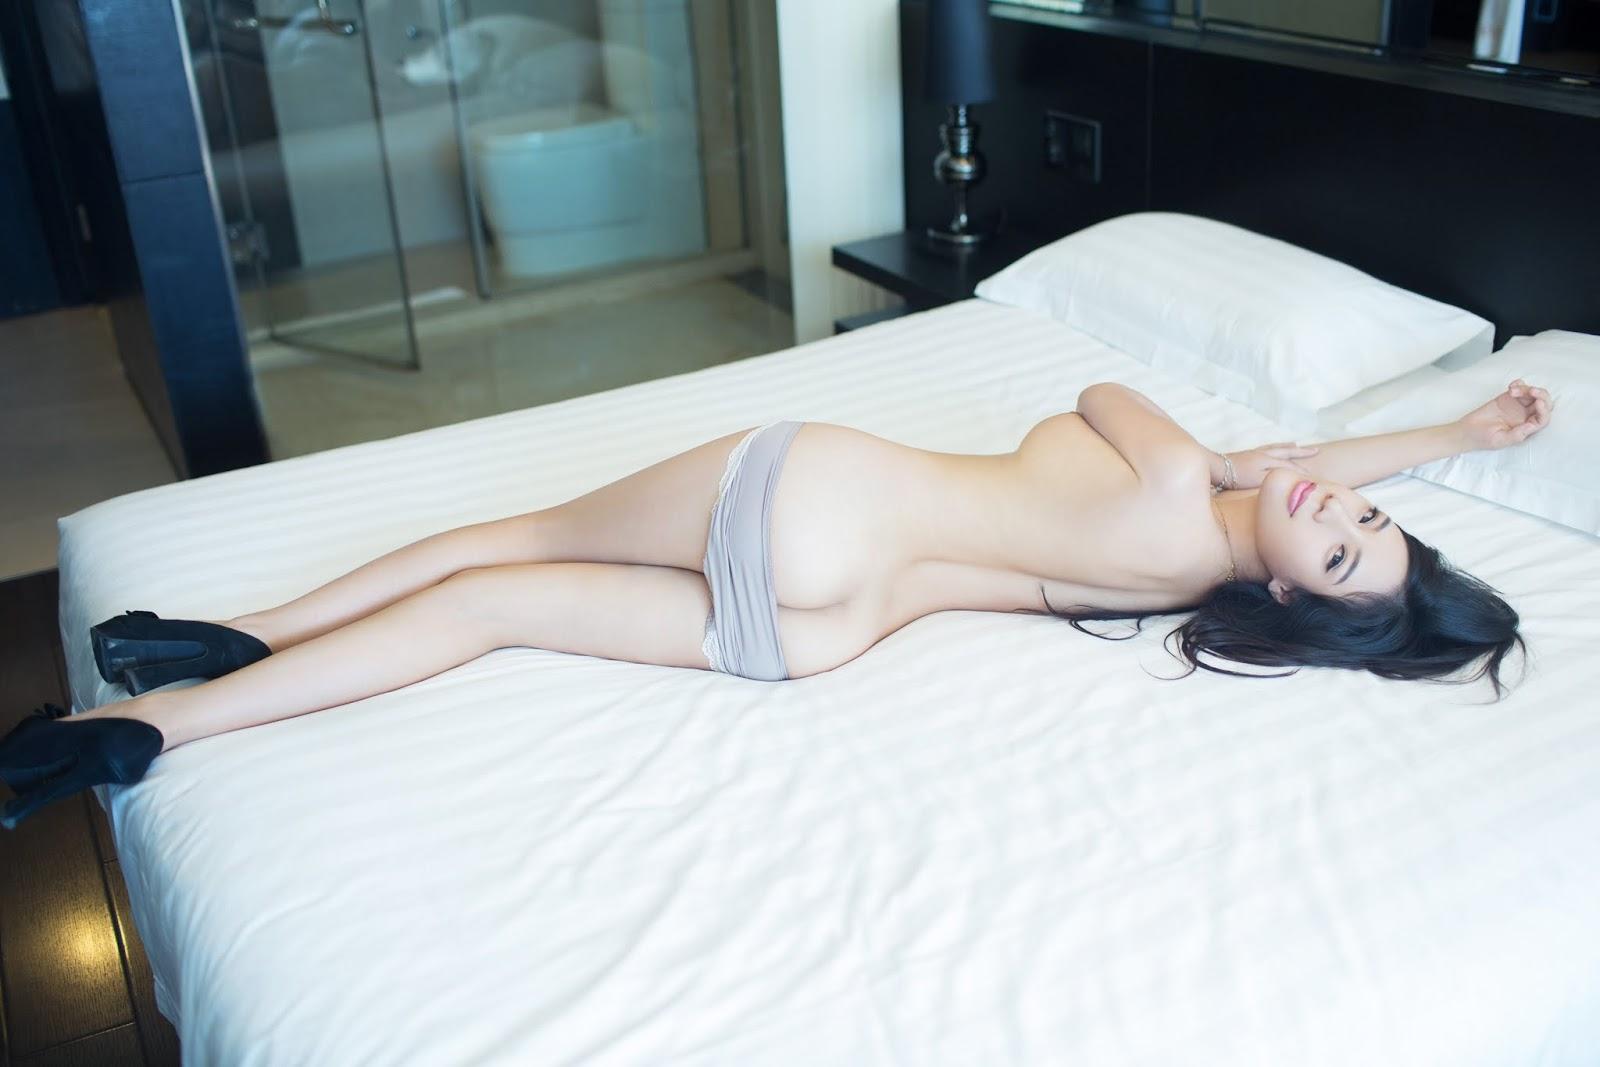 %25C2%25AC%252BO 01 - Hot Sexy Model TUIGIRL NO.46 Nude